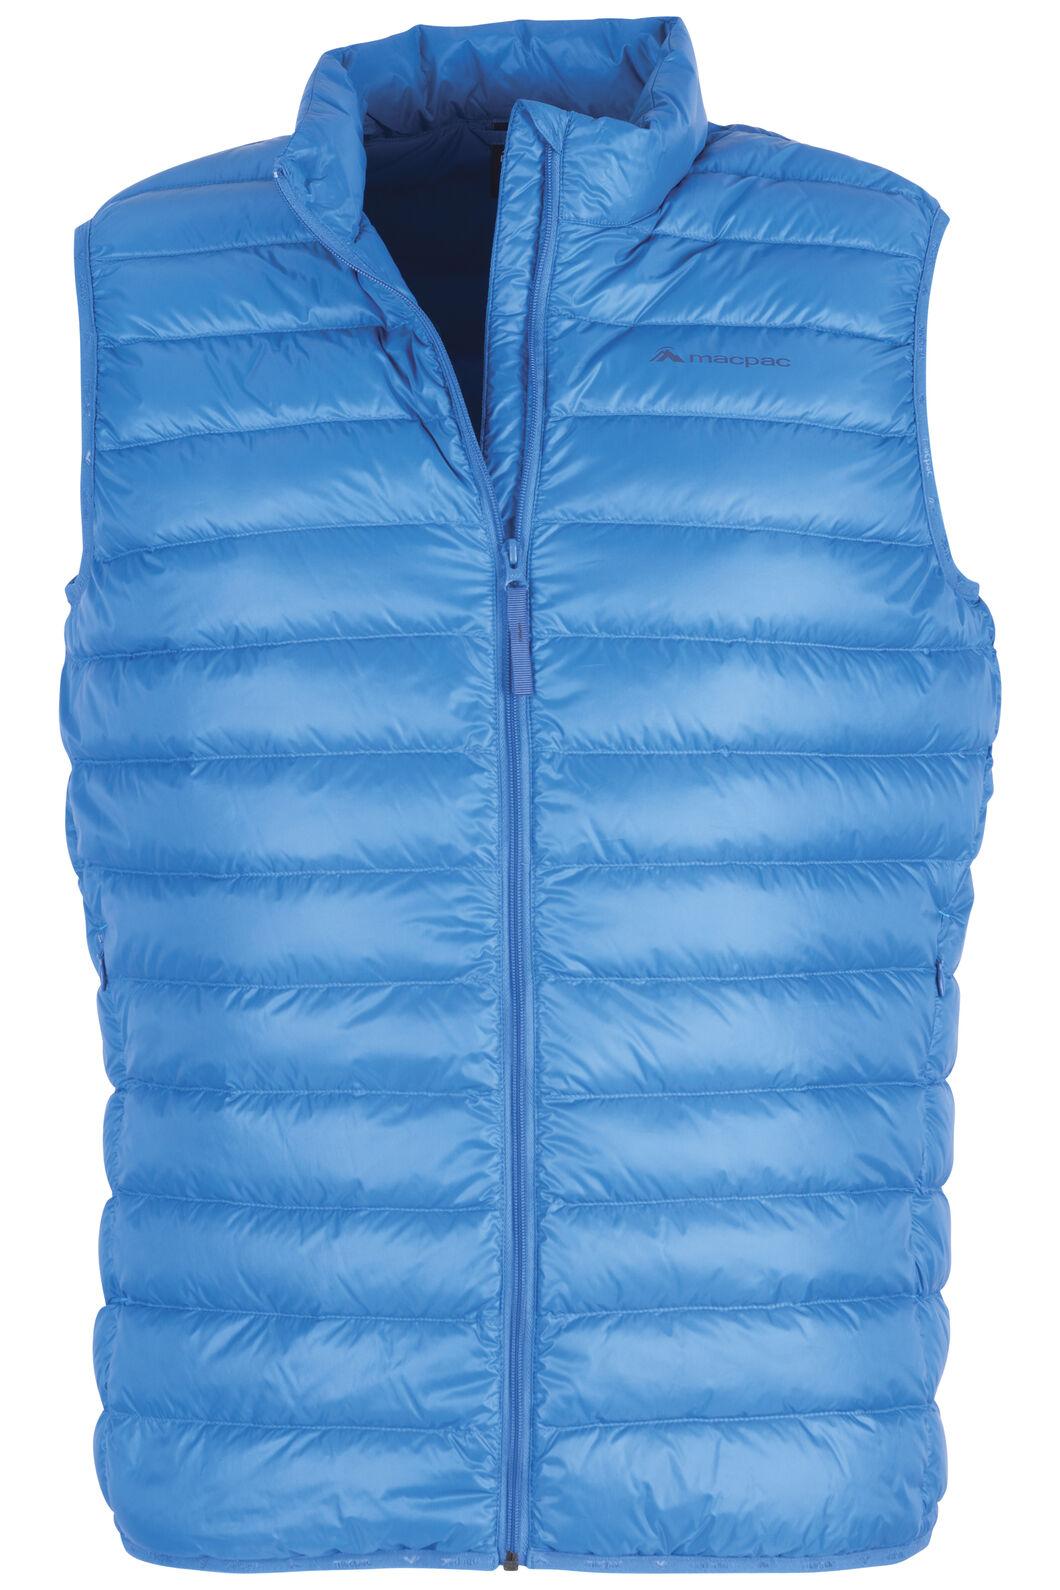 Macpac Uber Light Down Vest — Men's, Imperial Blue, hi-res